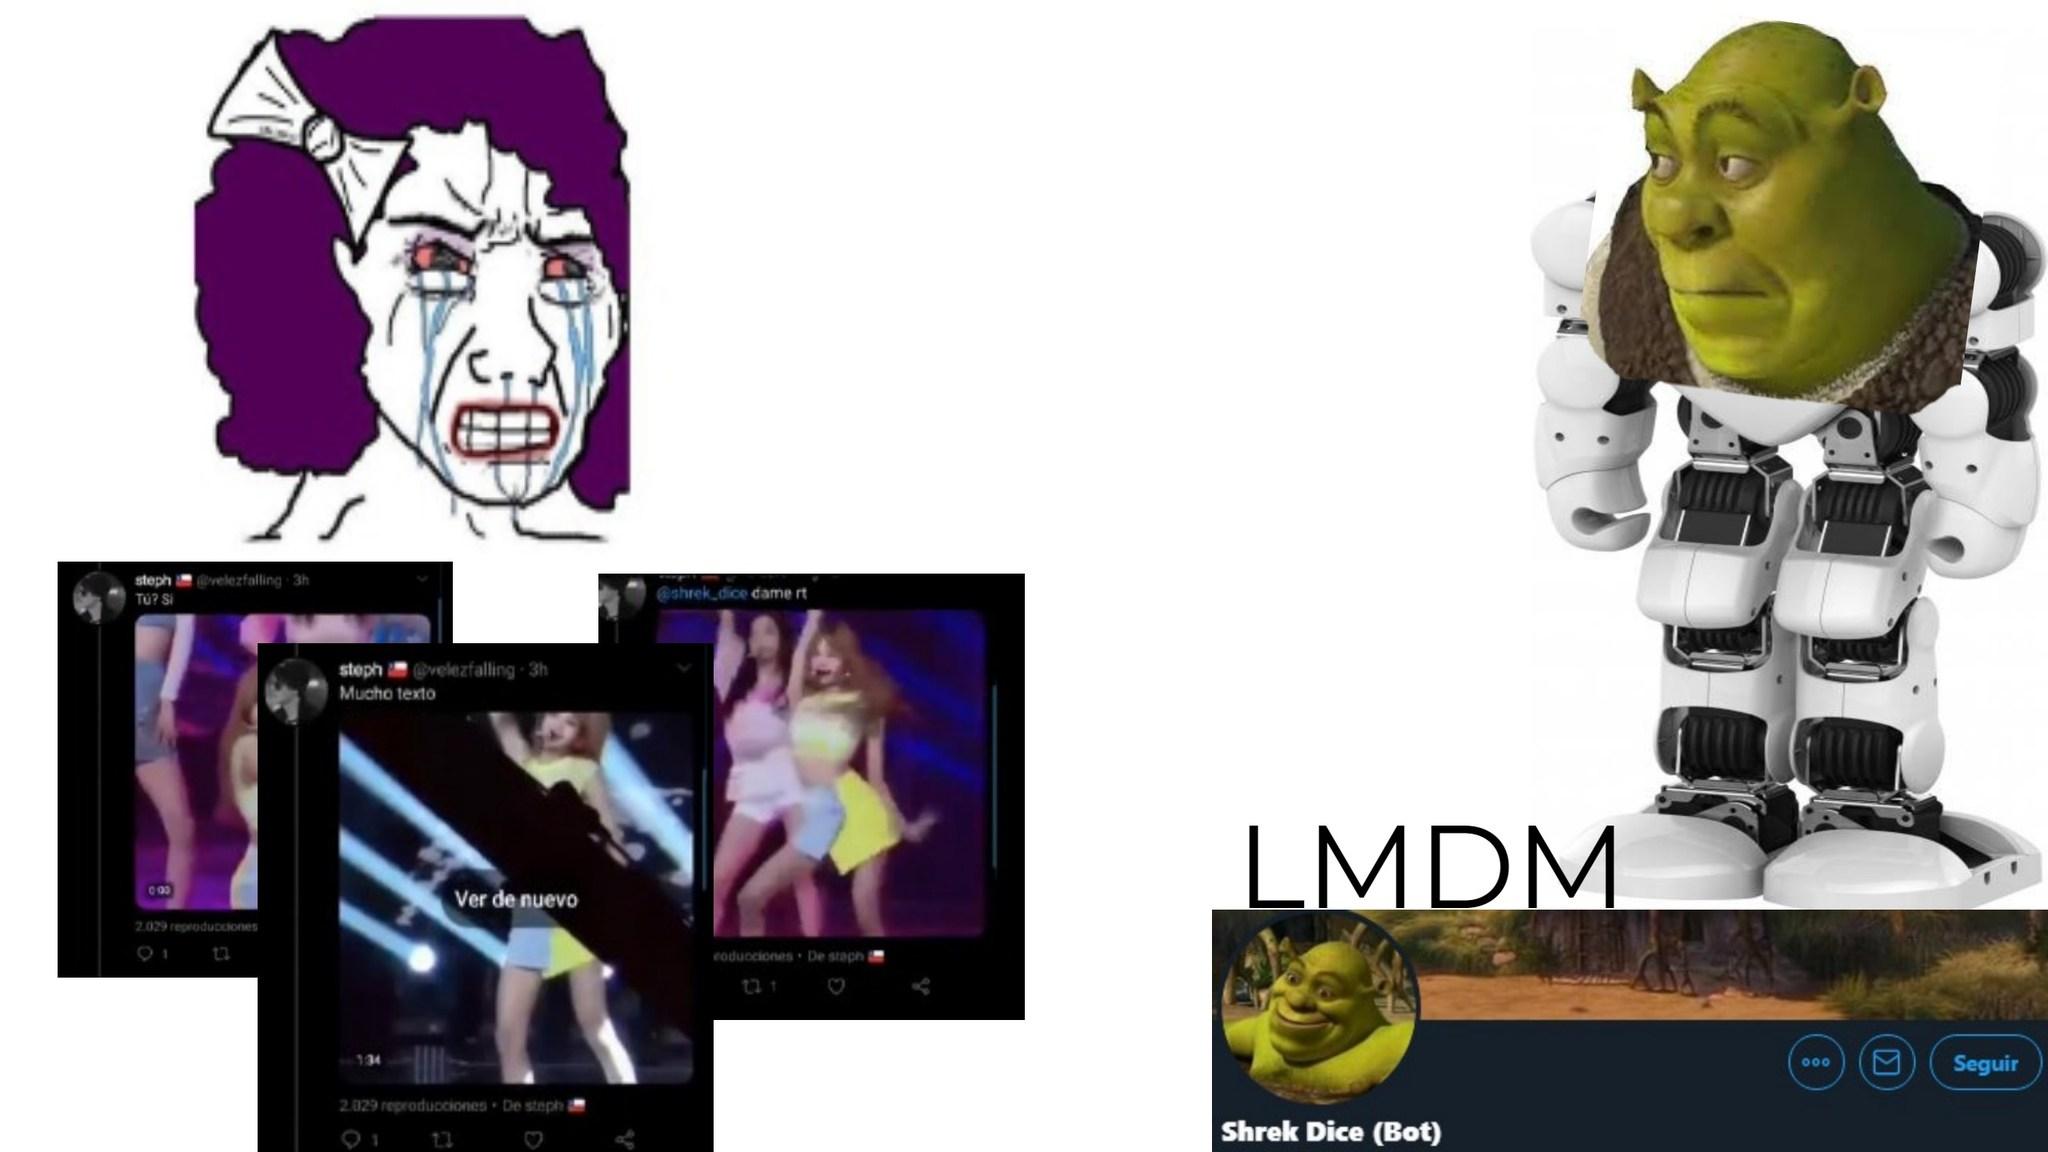 2iQ - meme